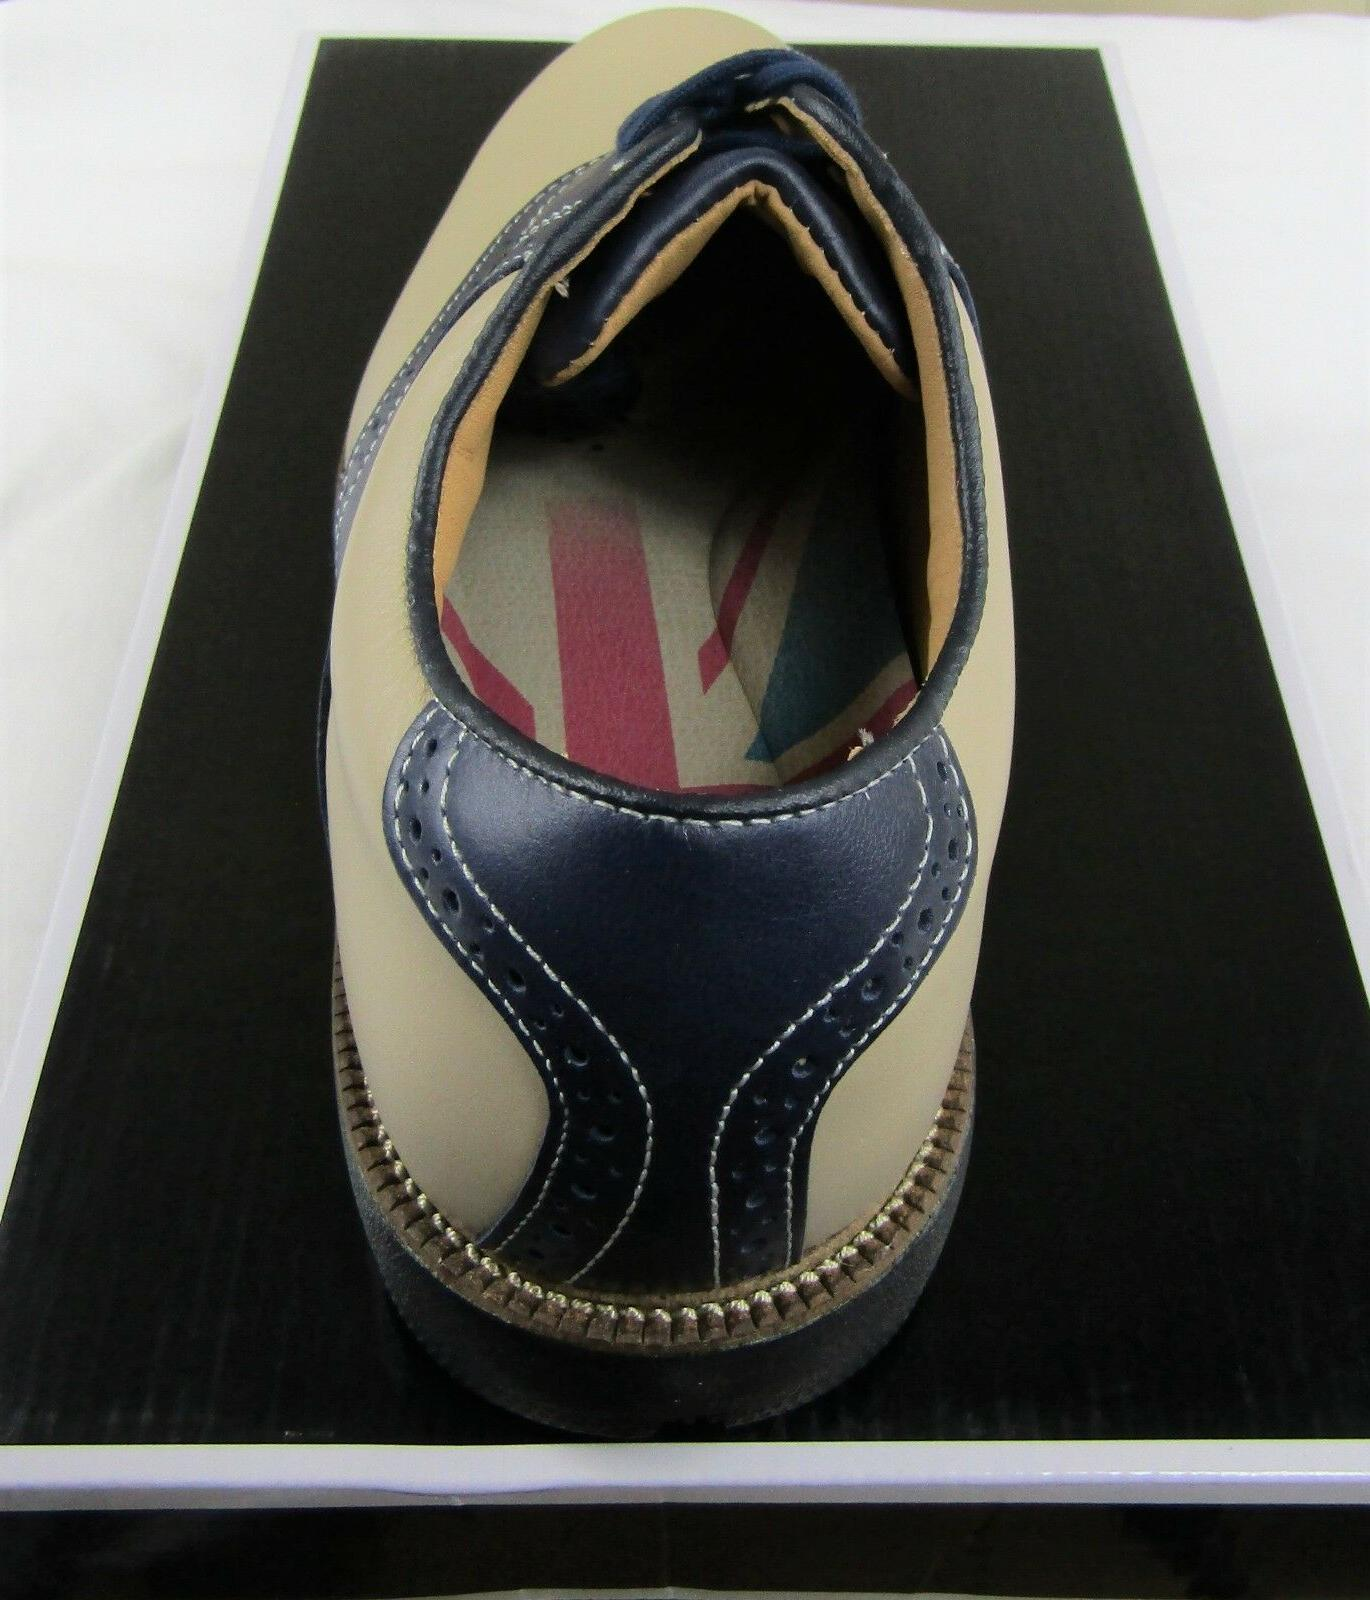 New Club Men's Golf Shoes, Bone & 57004